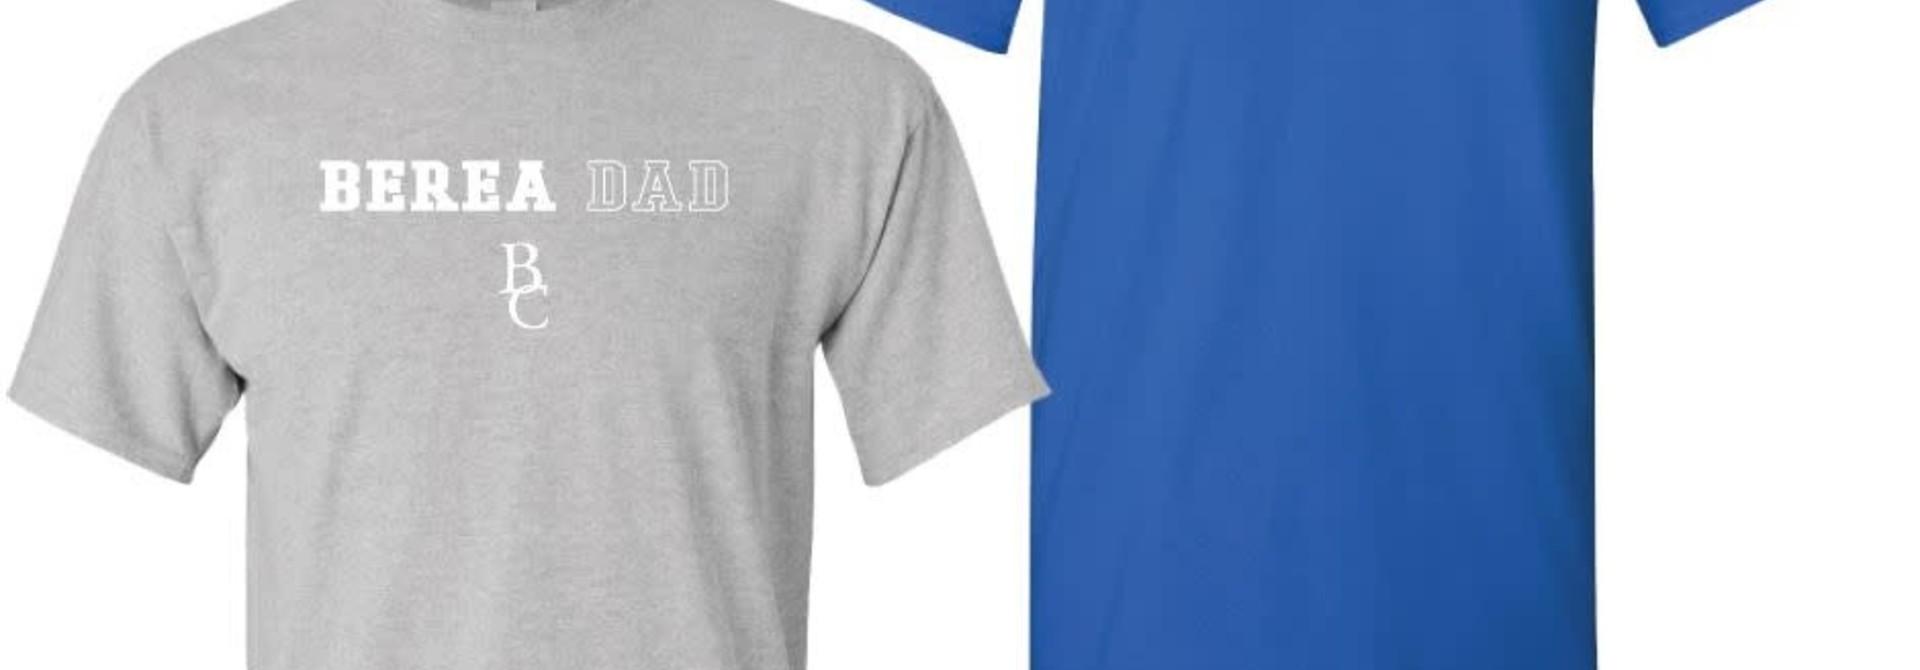 Berea Dad T-shirt